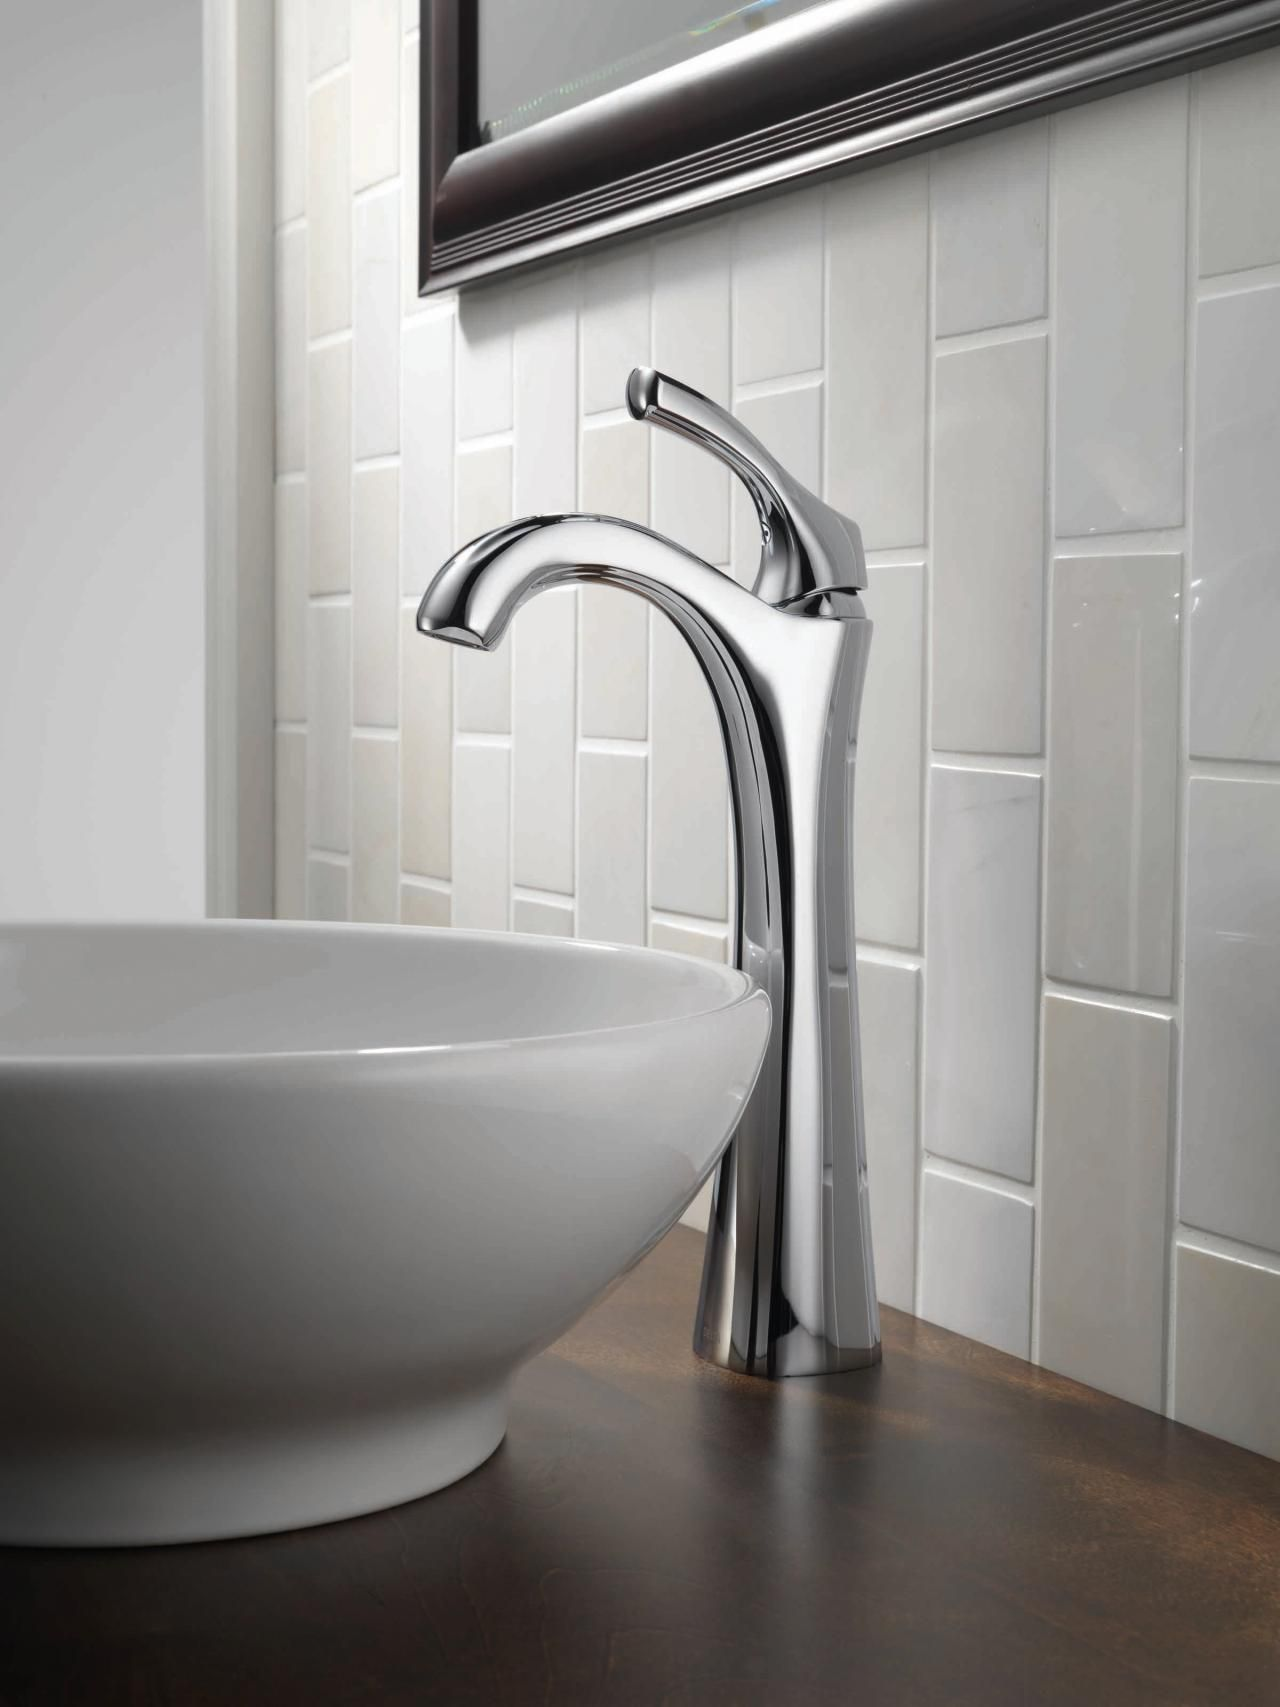 Bathroom Backsplash Styles and Trends | Bathroom Design - Choose Floor Plan & Bath Remodeling Materials | HGTV